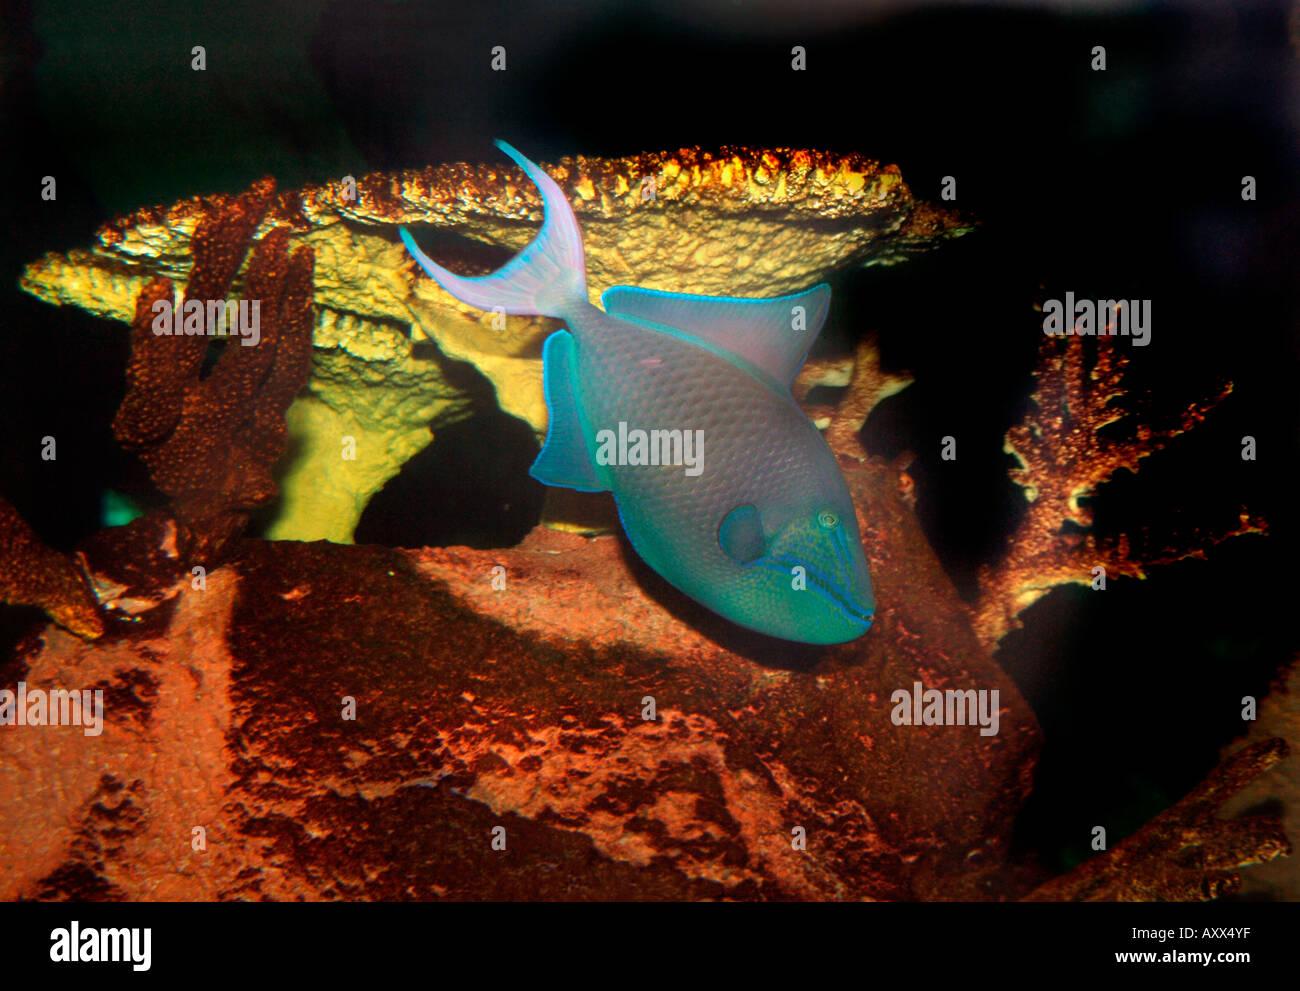 Niger Trigger Fish (Odonus niger) - Stock Image